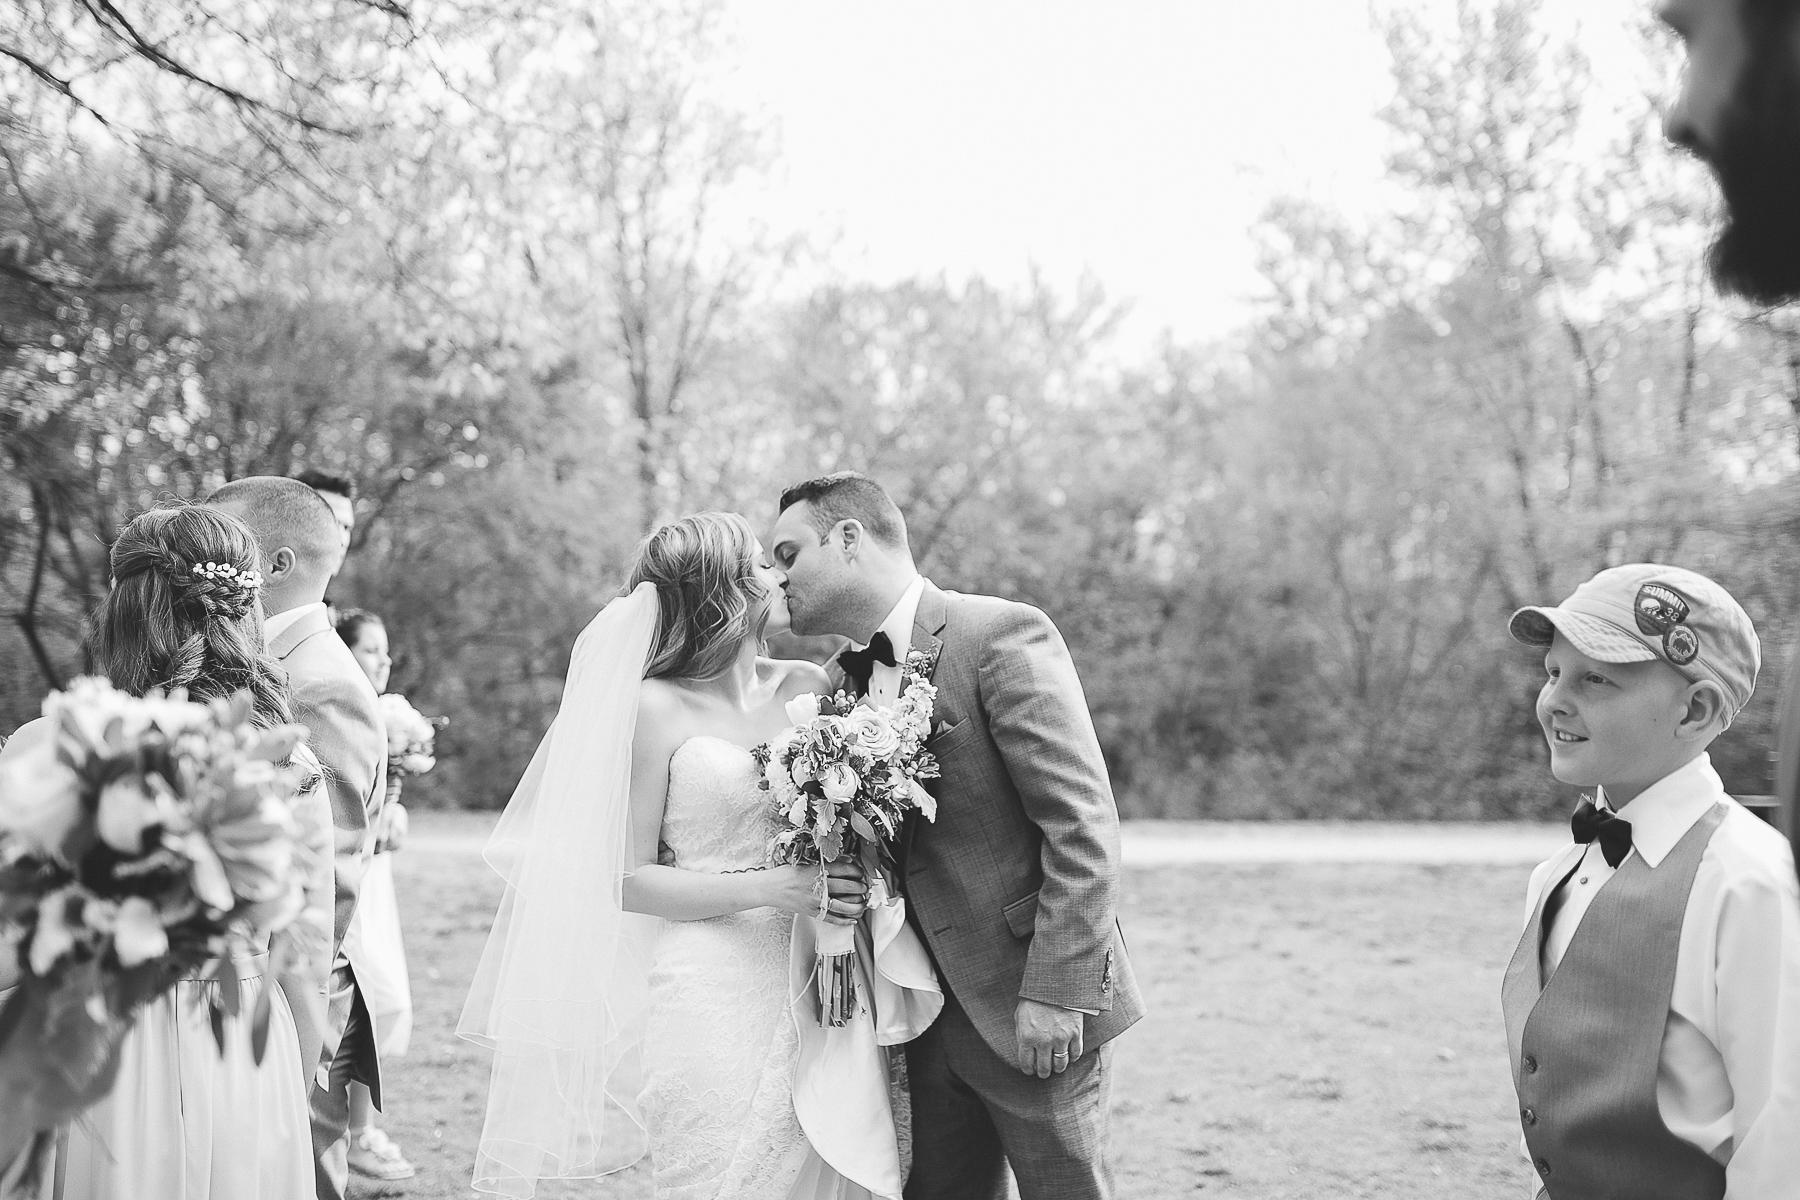 boston wedding photographer 11 Â boston wedding photographer new